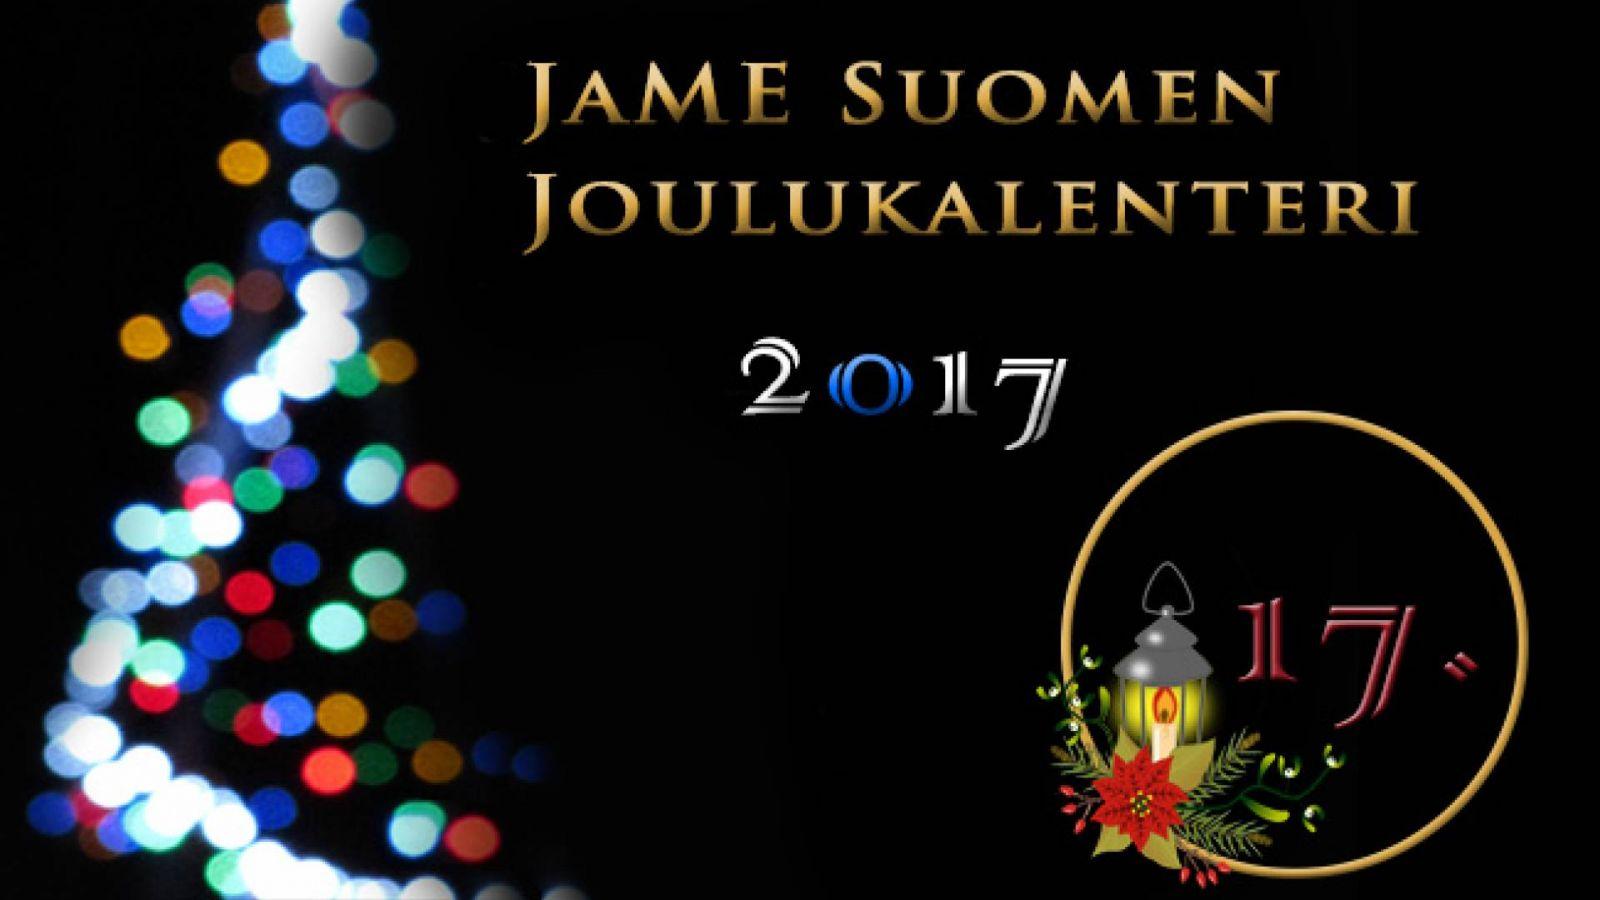 JaME Suomen joulukalenterin 17. luukku © Nipsu